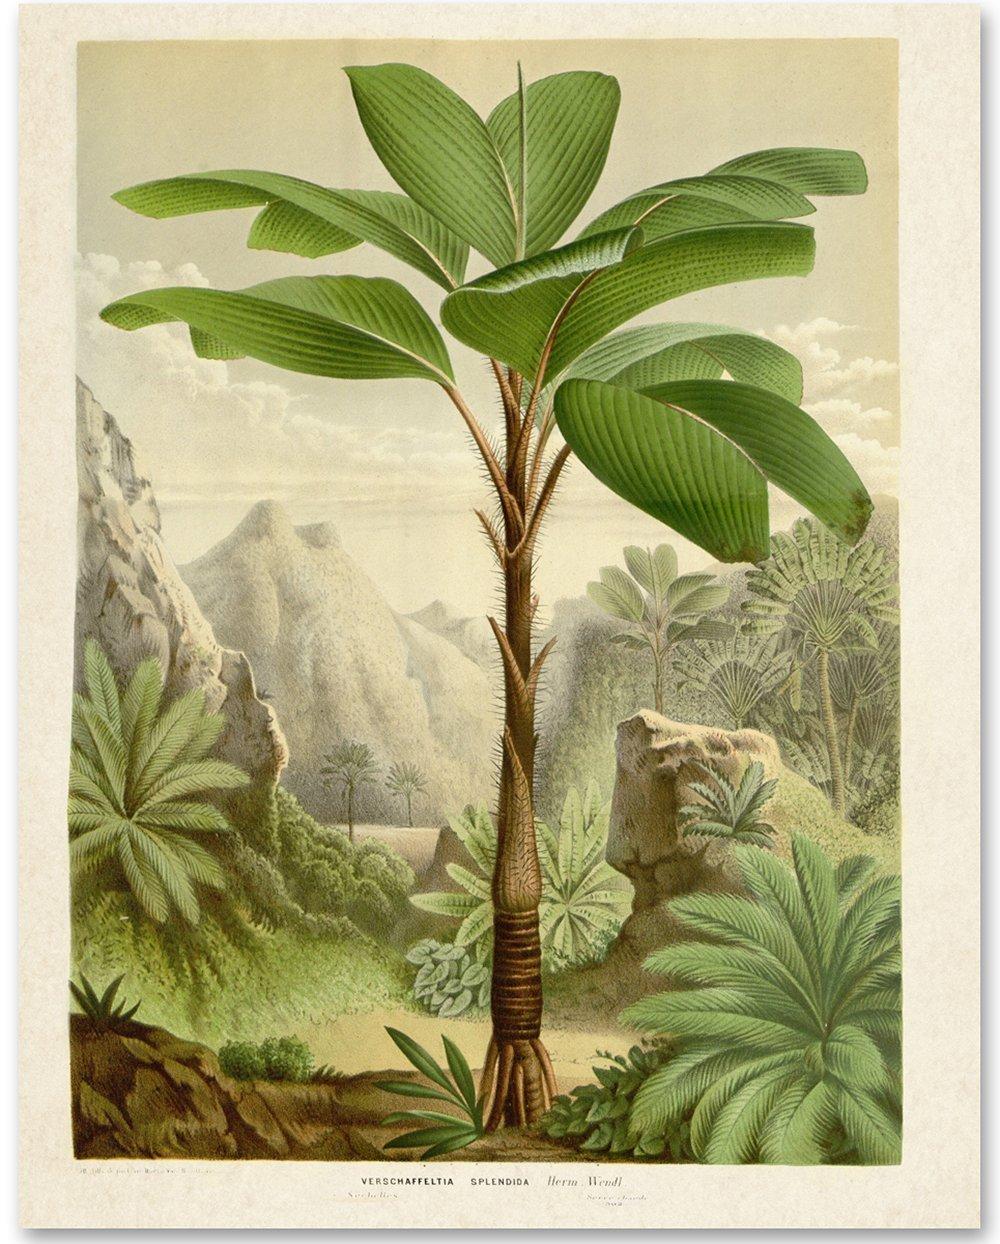 Verschaffeltia Splendida Palm Botanical Industry No. 1 11x14 - Product Illustration Unf